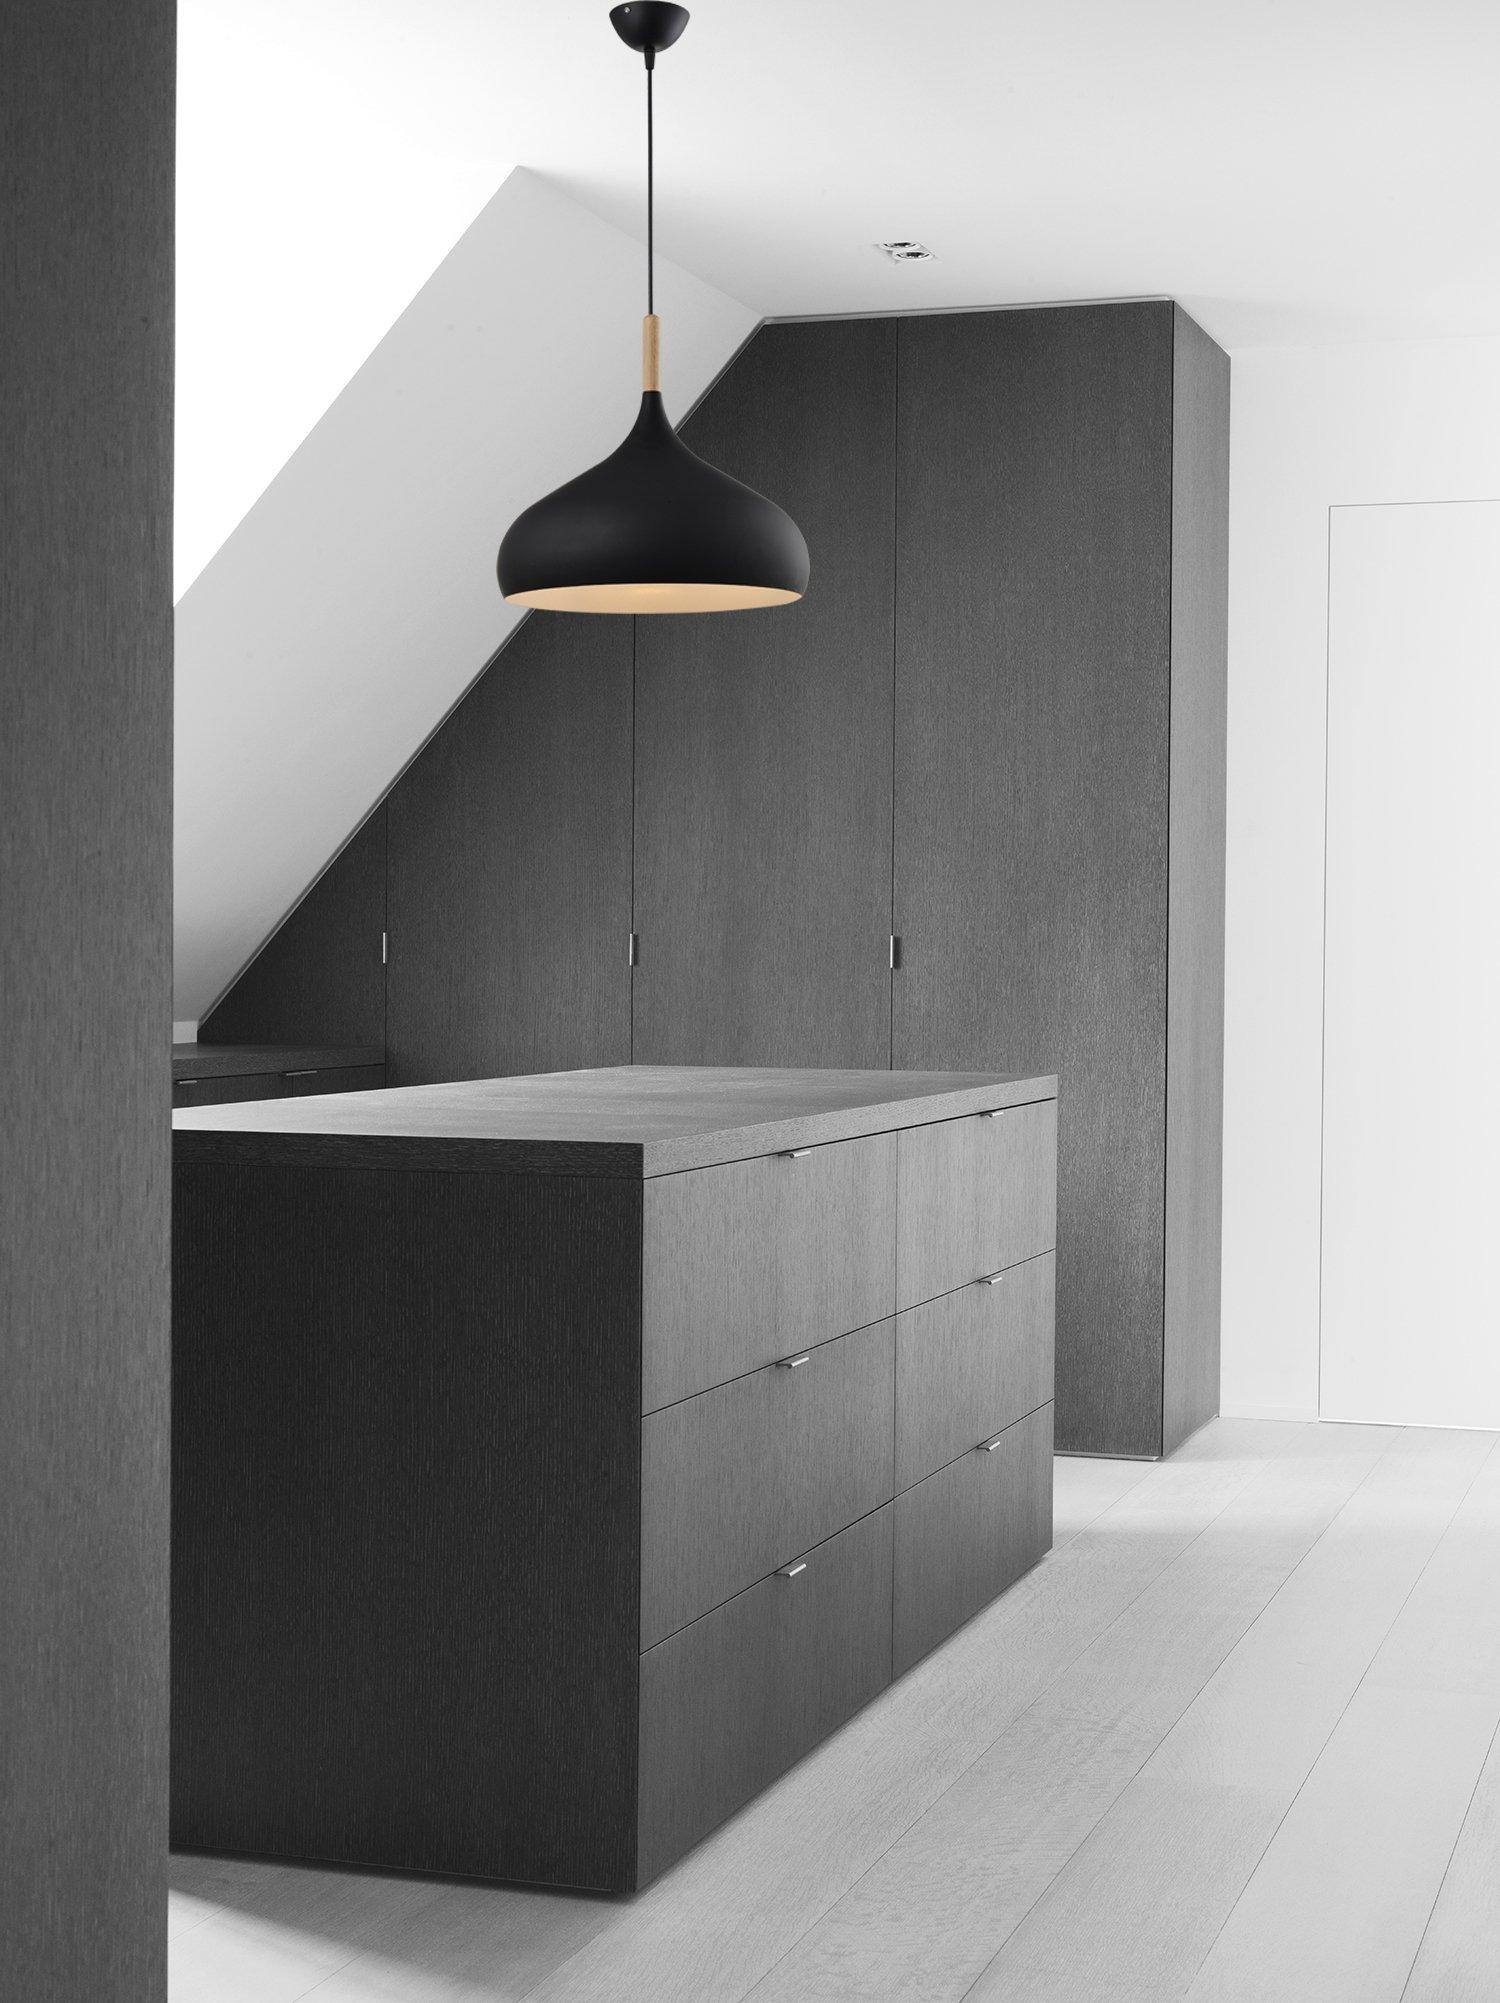 Modern Wood Black Metal Pendant Lighting - Battaa CLV8076-M (2018 New Design) Industrial Chandelier Fixture Ceiling Shade Onion Aluminum Retro Loft Lamp For the Dining Room Bar Cafe 2-Year Warranty